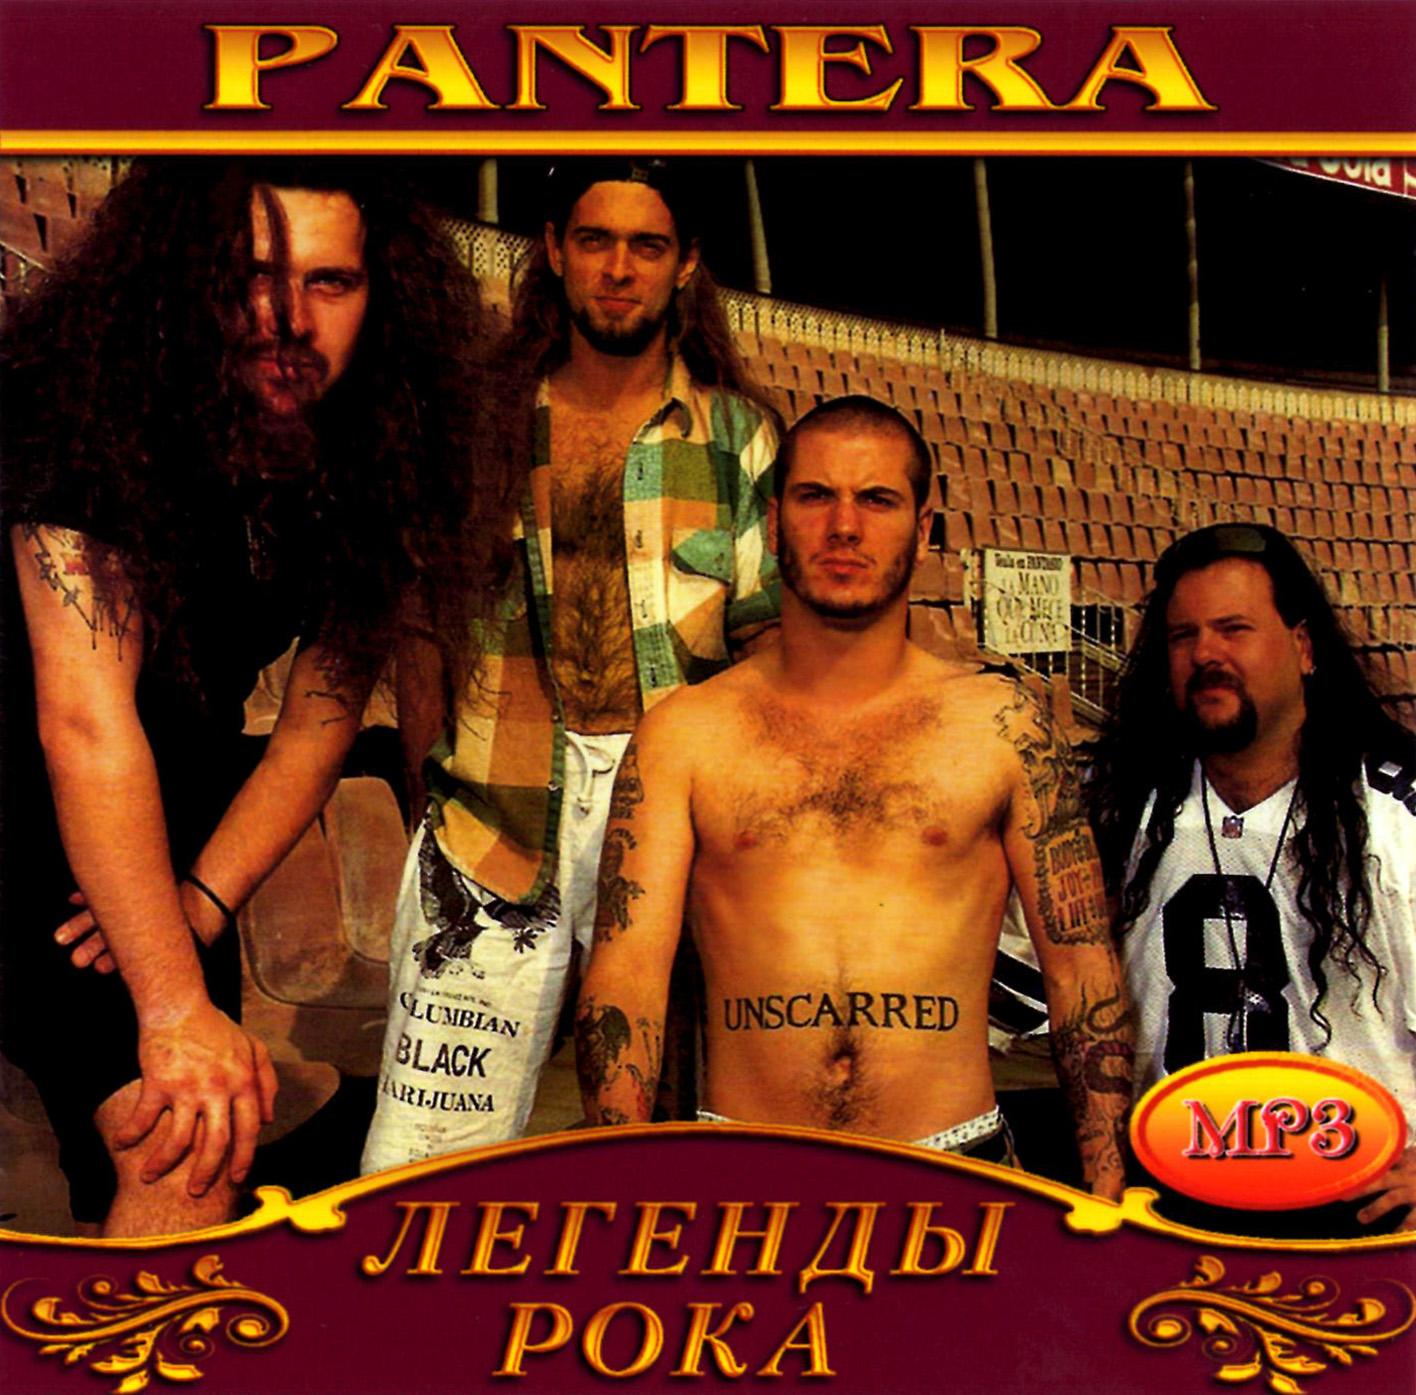 Pantera [mp3]